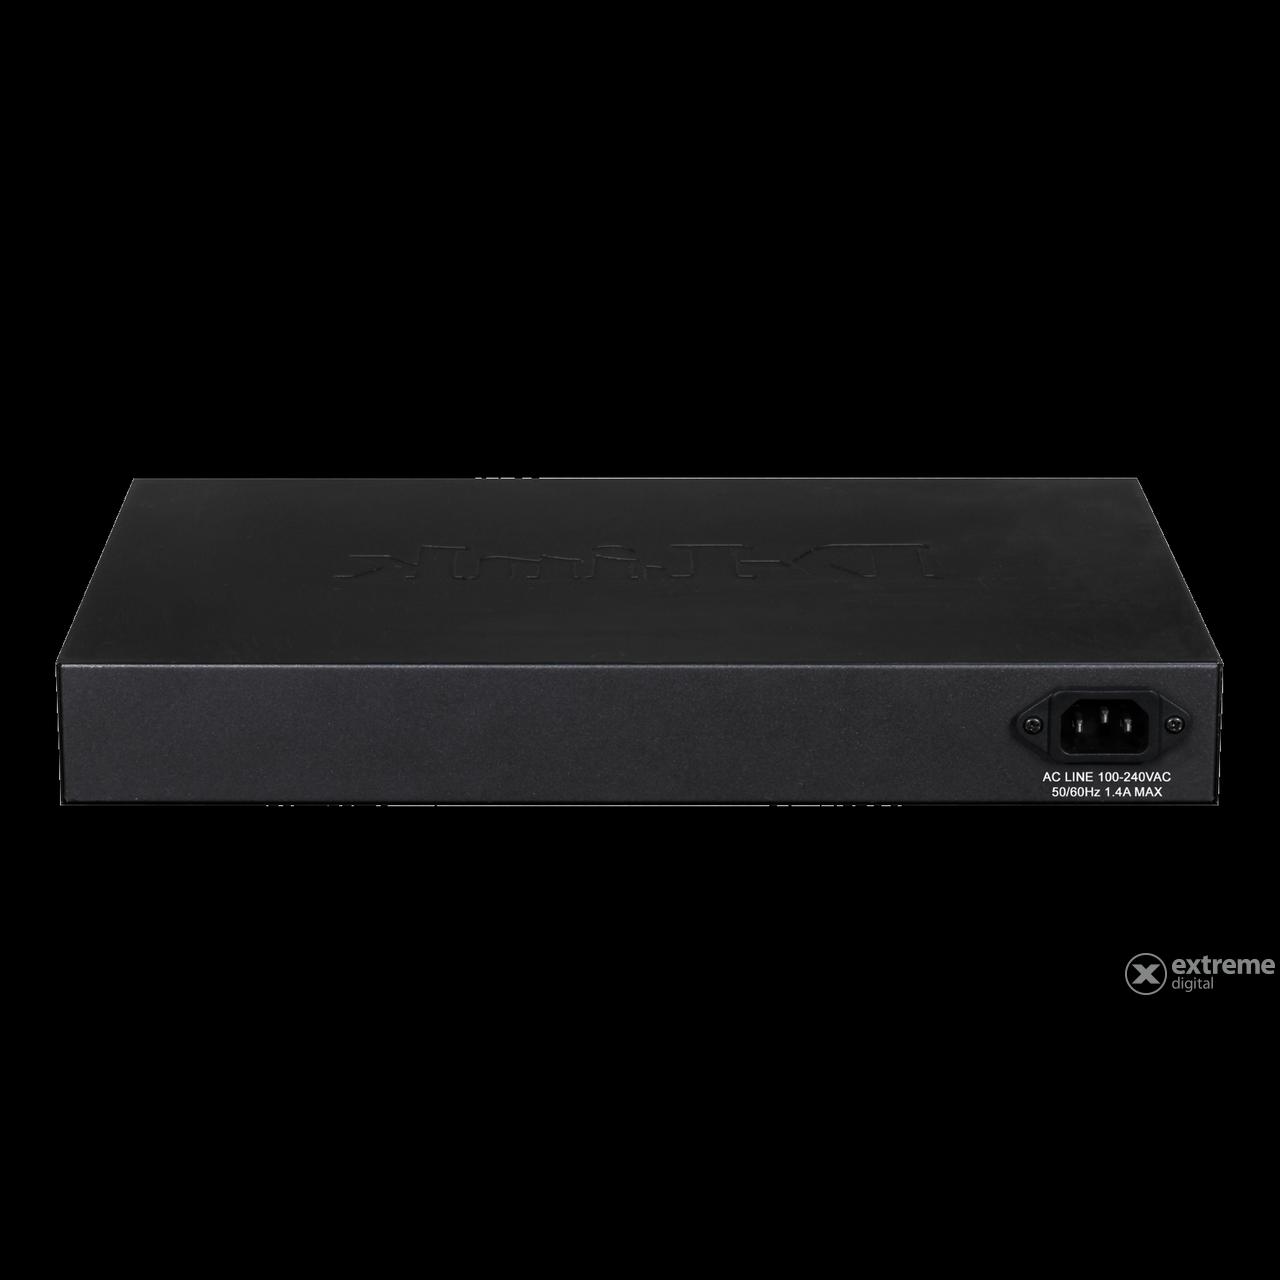 D Link 16 Port 10 100 1000 Mbps Gigabit Smart Switch 4 Sfp Porttal Dgs 1210 E